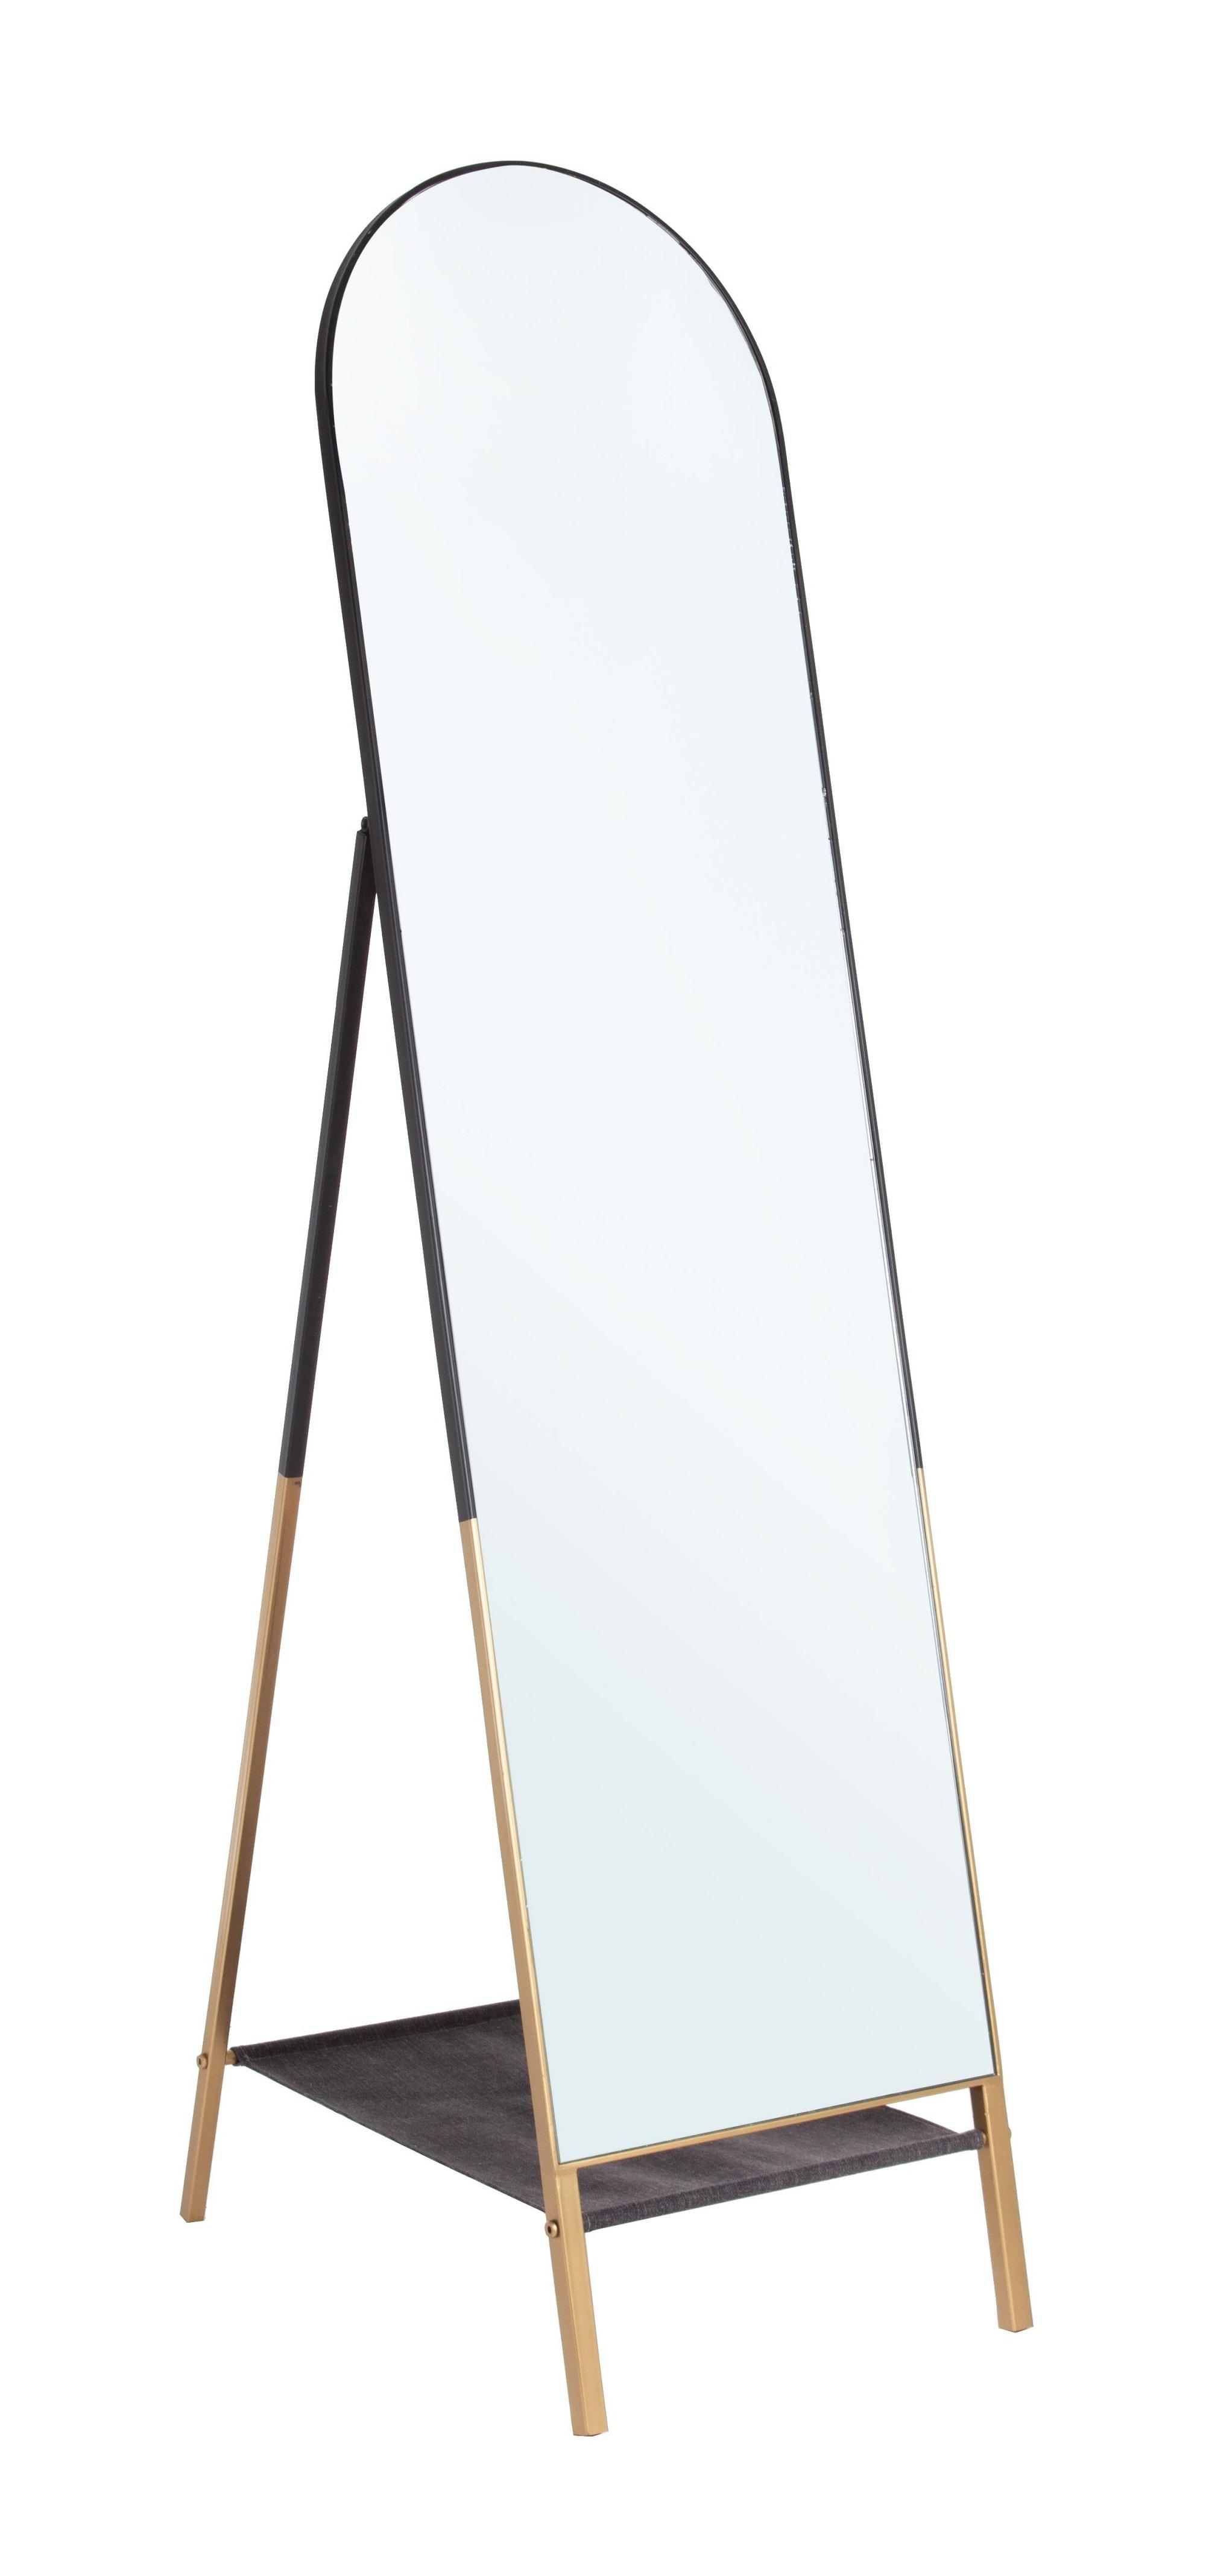 Oglinda Decorativa Metal Reflix Negru Auriu